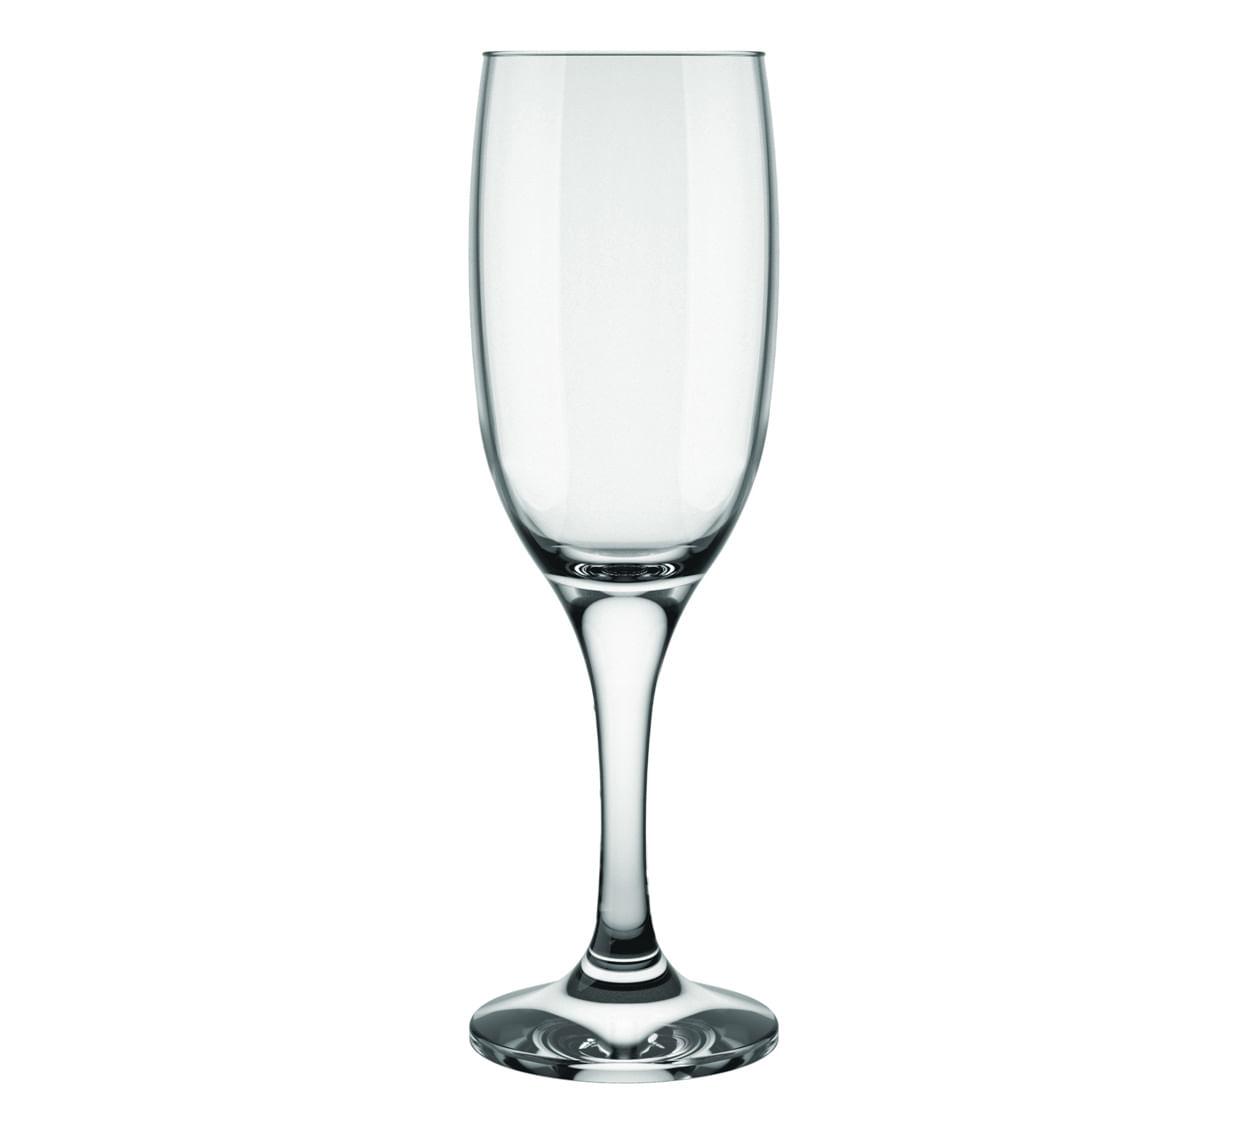 Jogo 6 Taças Windsor 7828 Champagne - Nadir Figueiredo